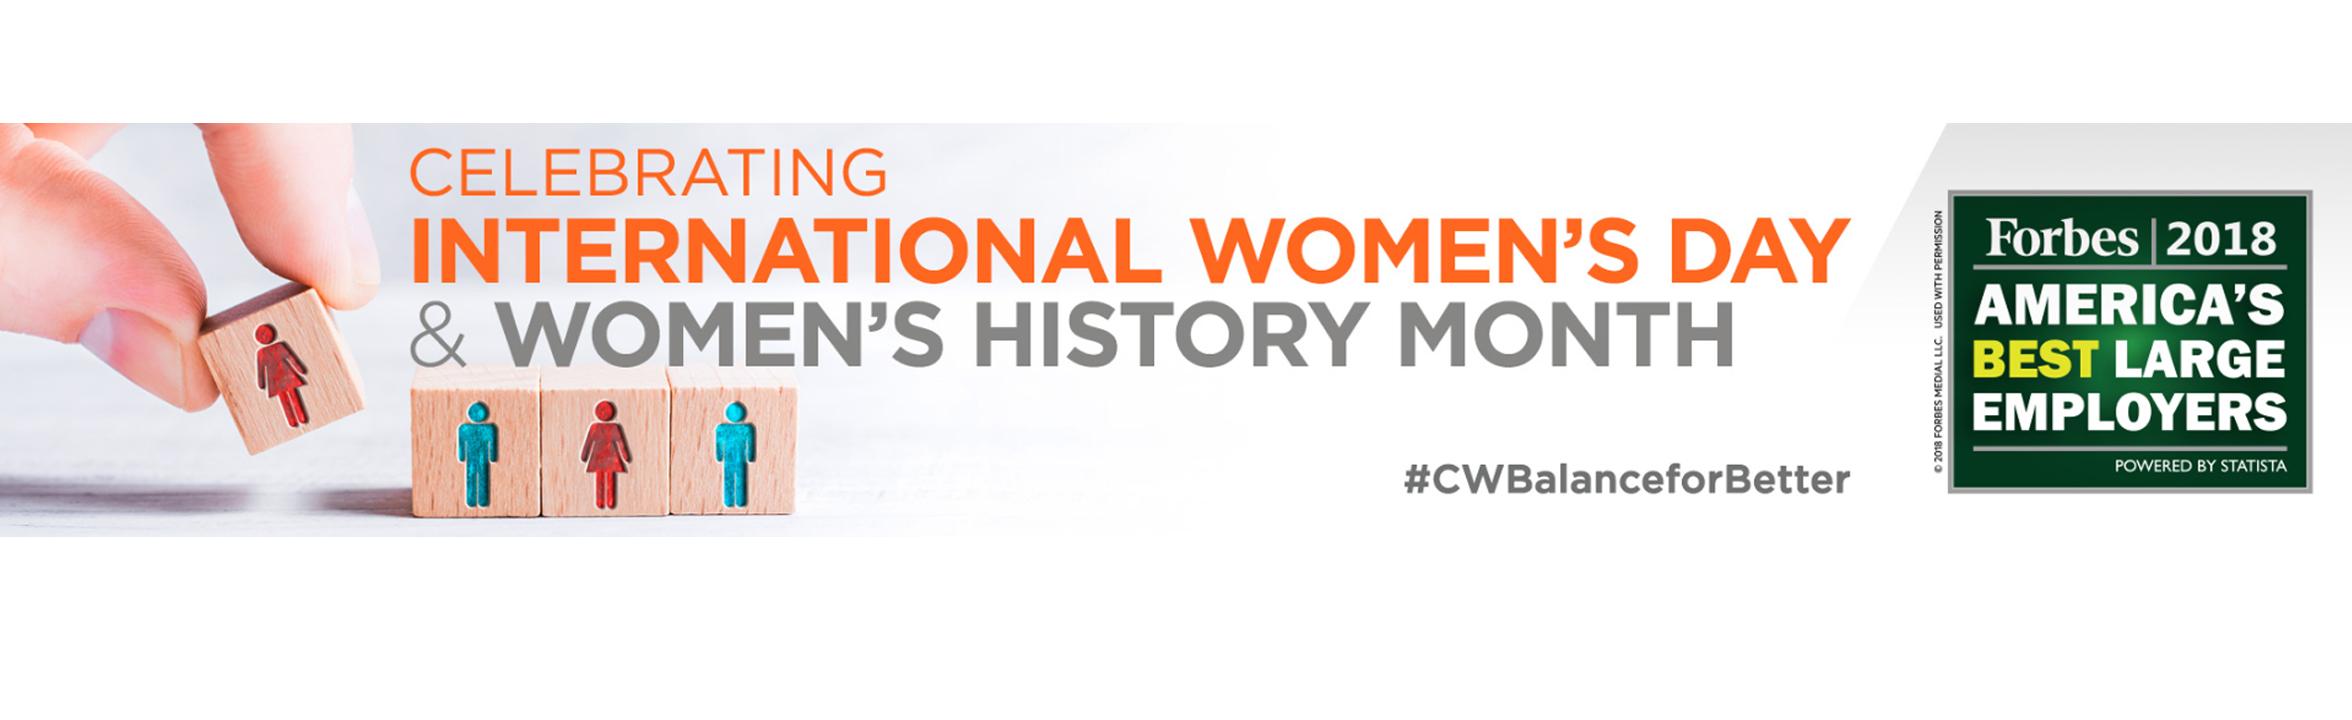 2019 International Women's Day Banner